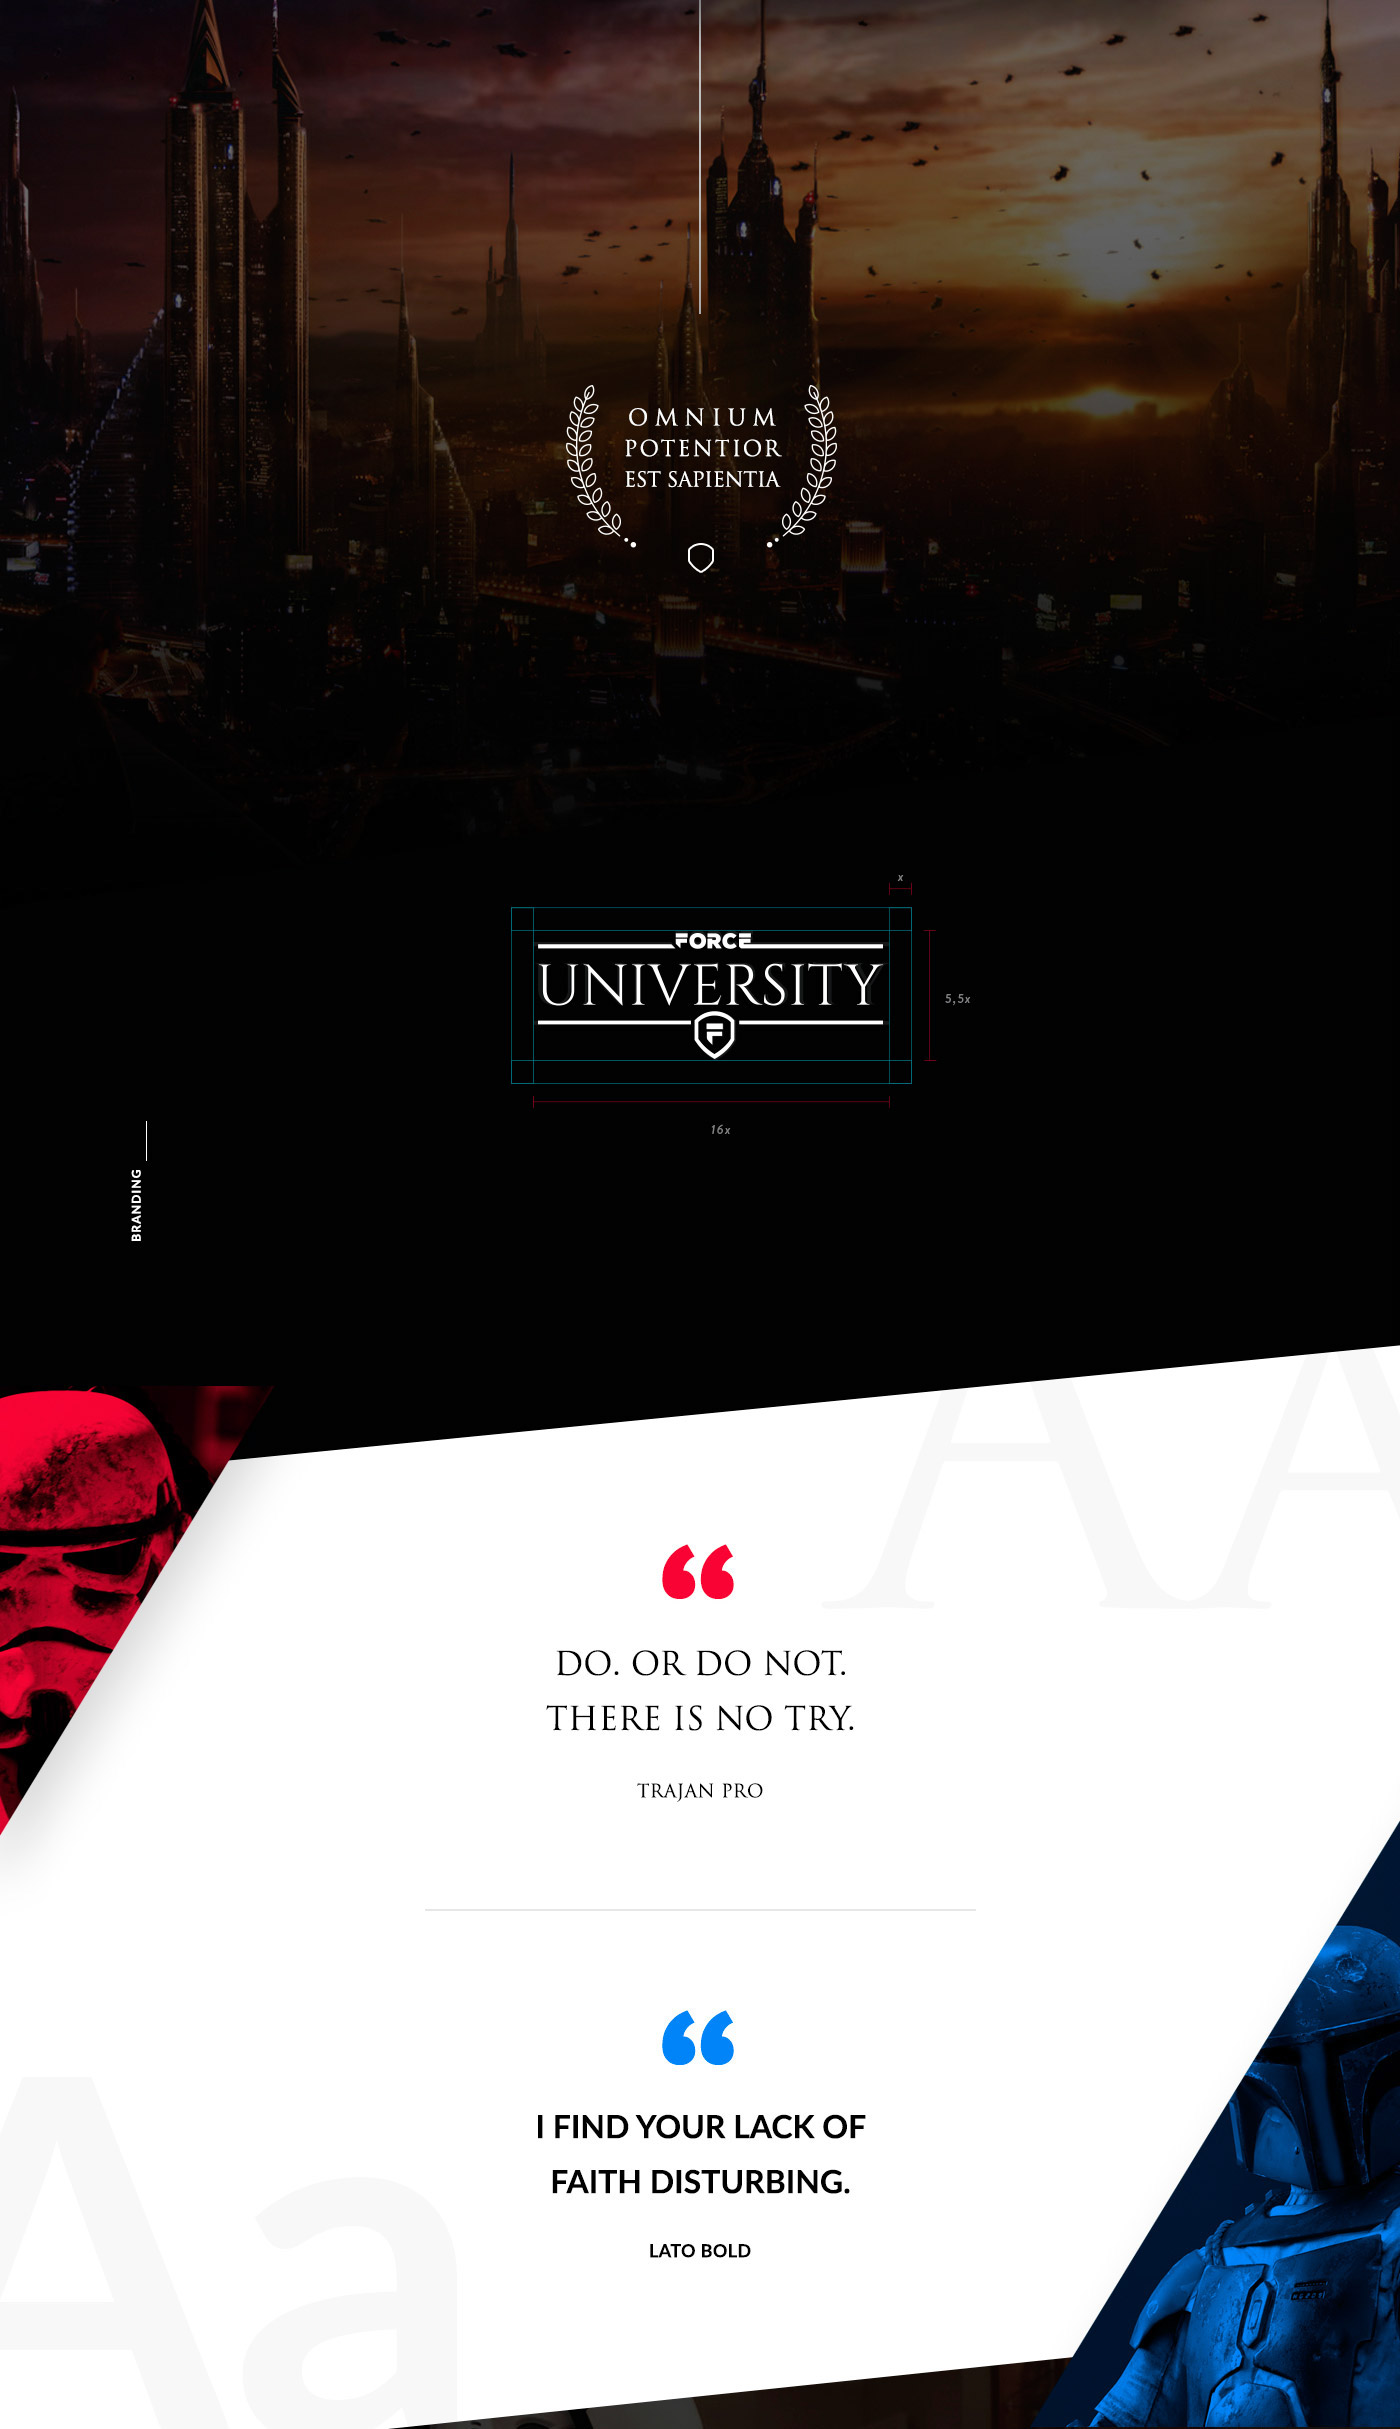 star wars jedi sith R2D2 Web brand app ux UI campus University icons faculty force padawan